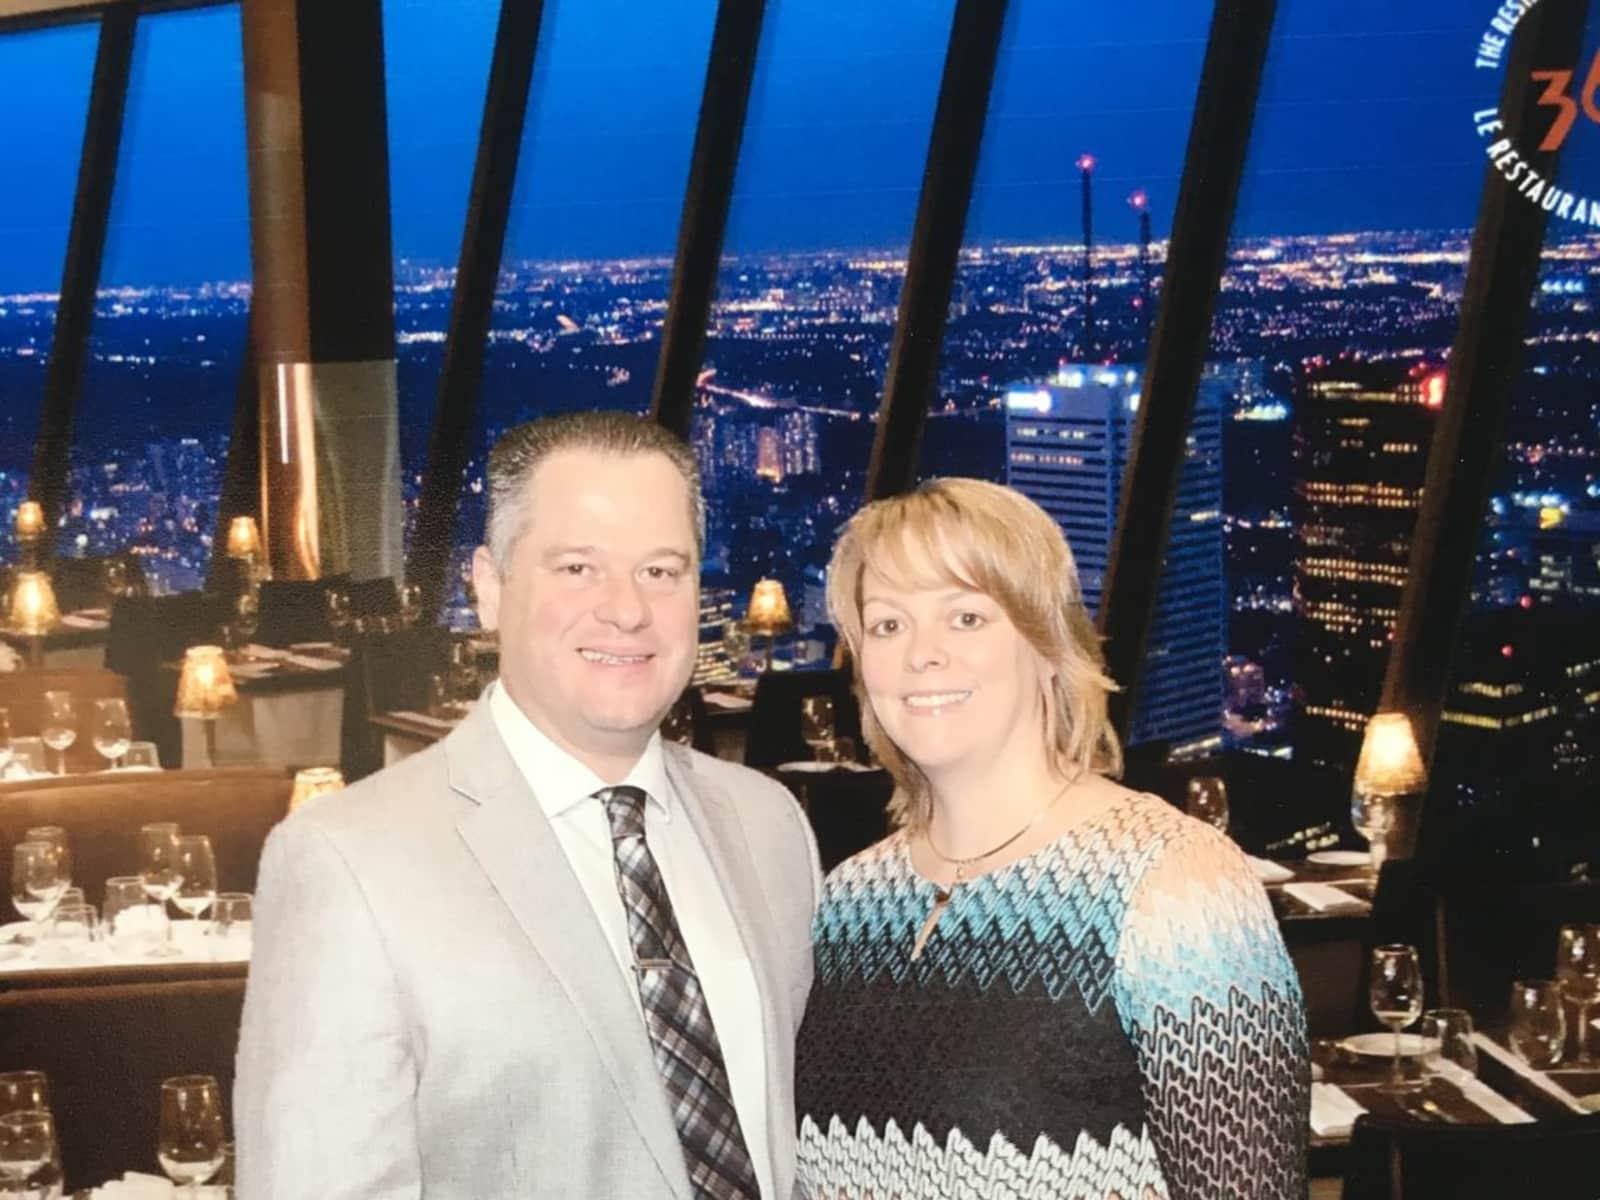 Charlene & Shawn from Toronto, Ontario, Canada